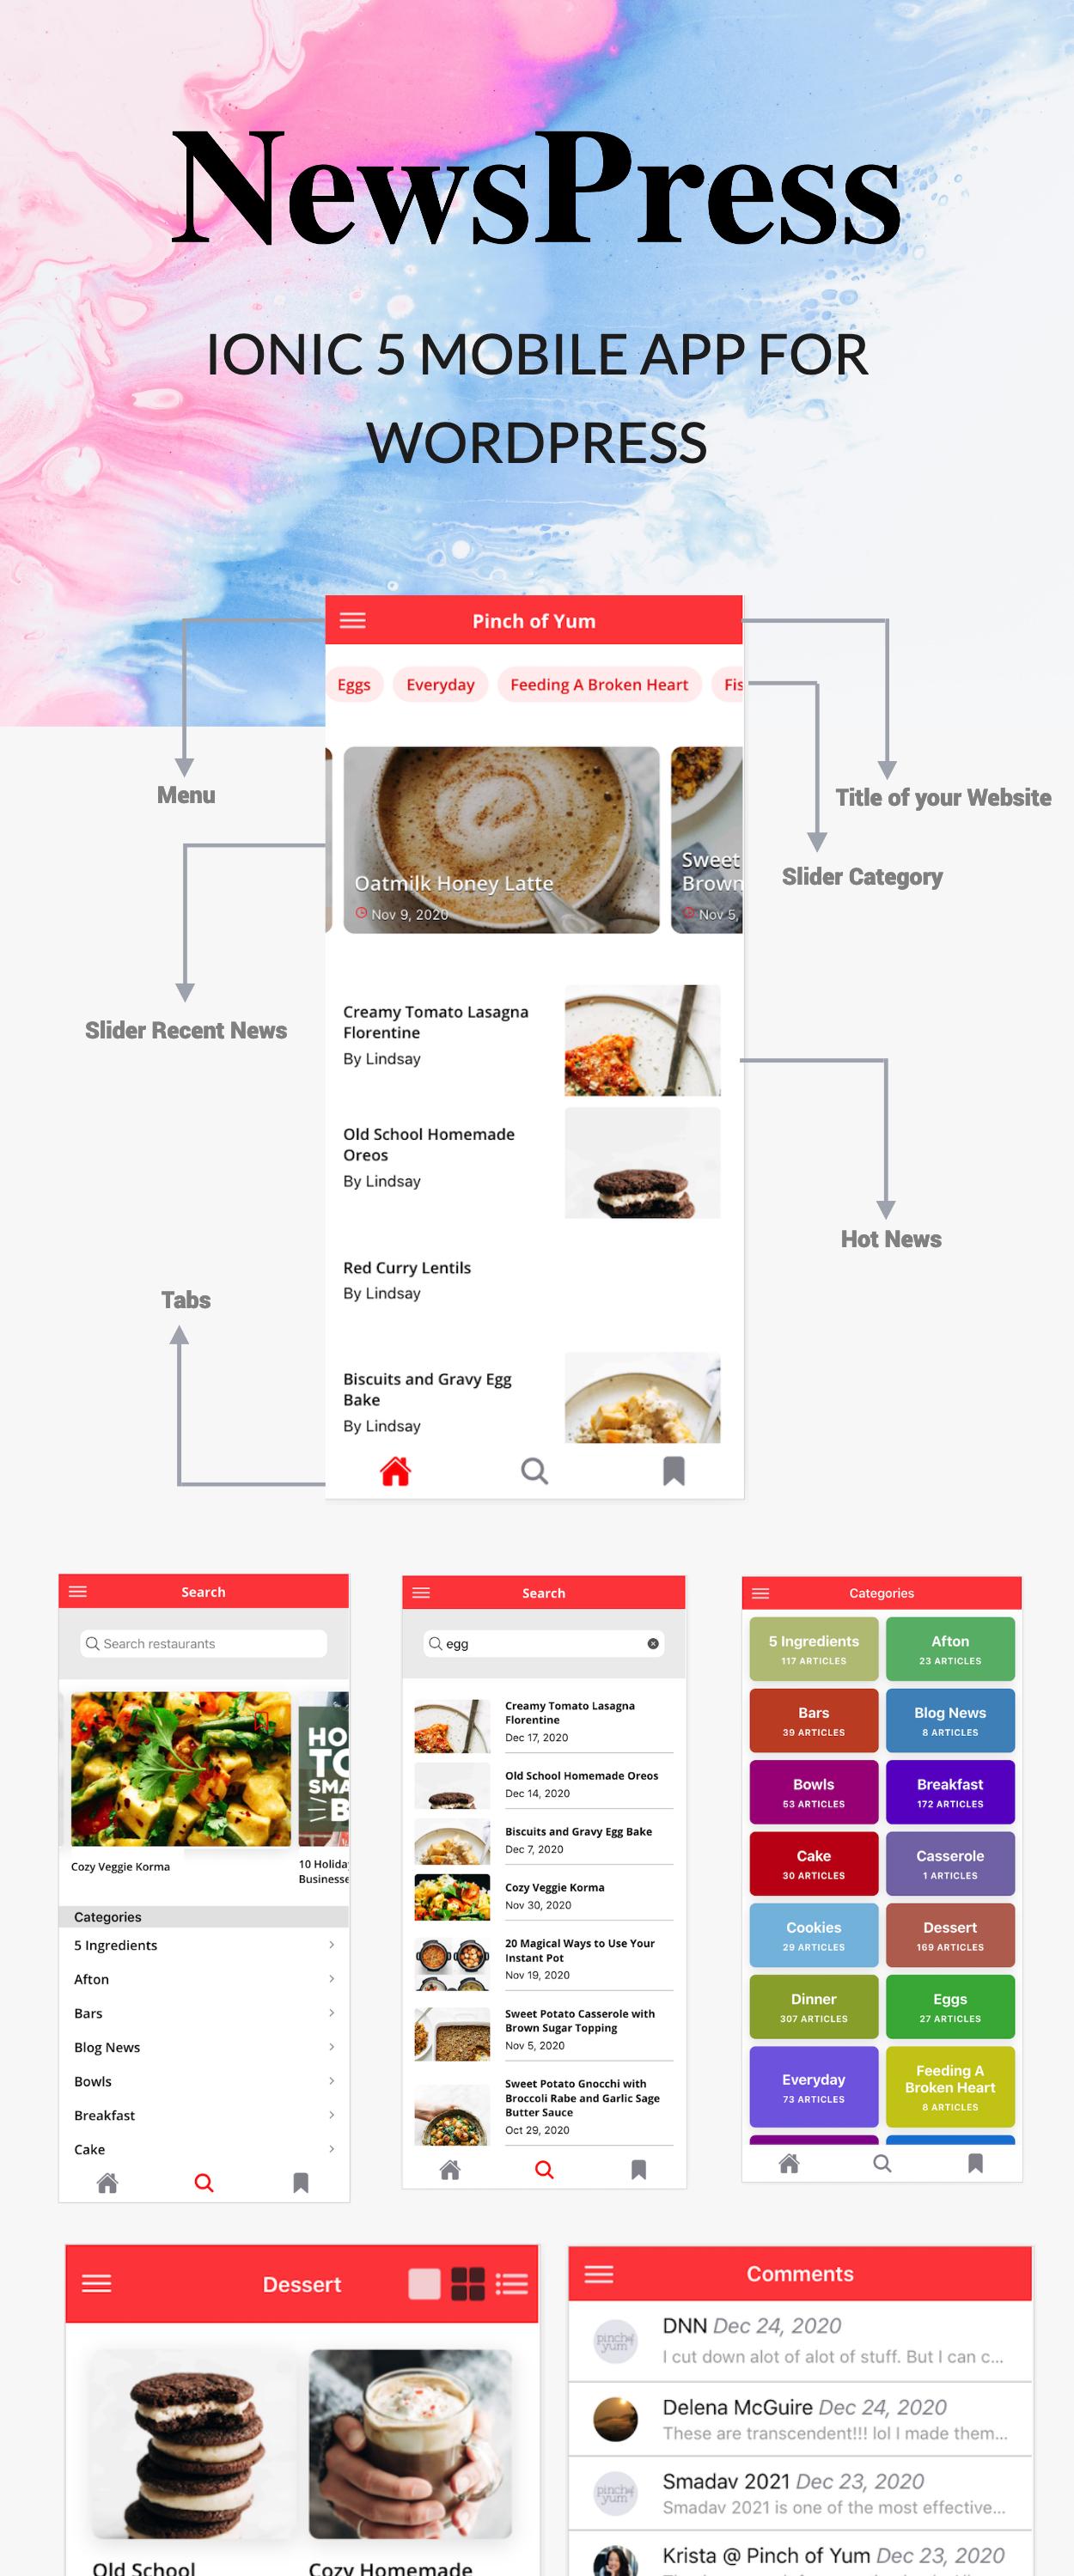 NewsPress - Ionic 5 mobile app for WordPress - 3